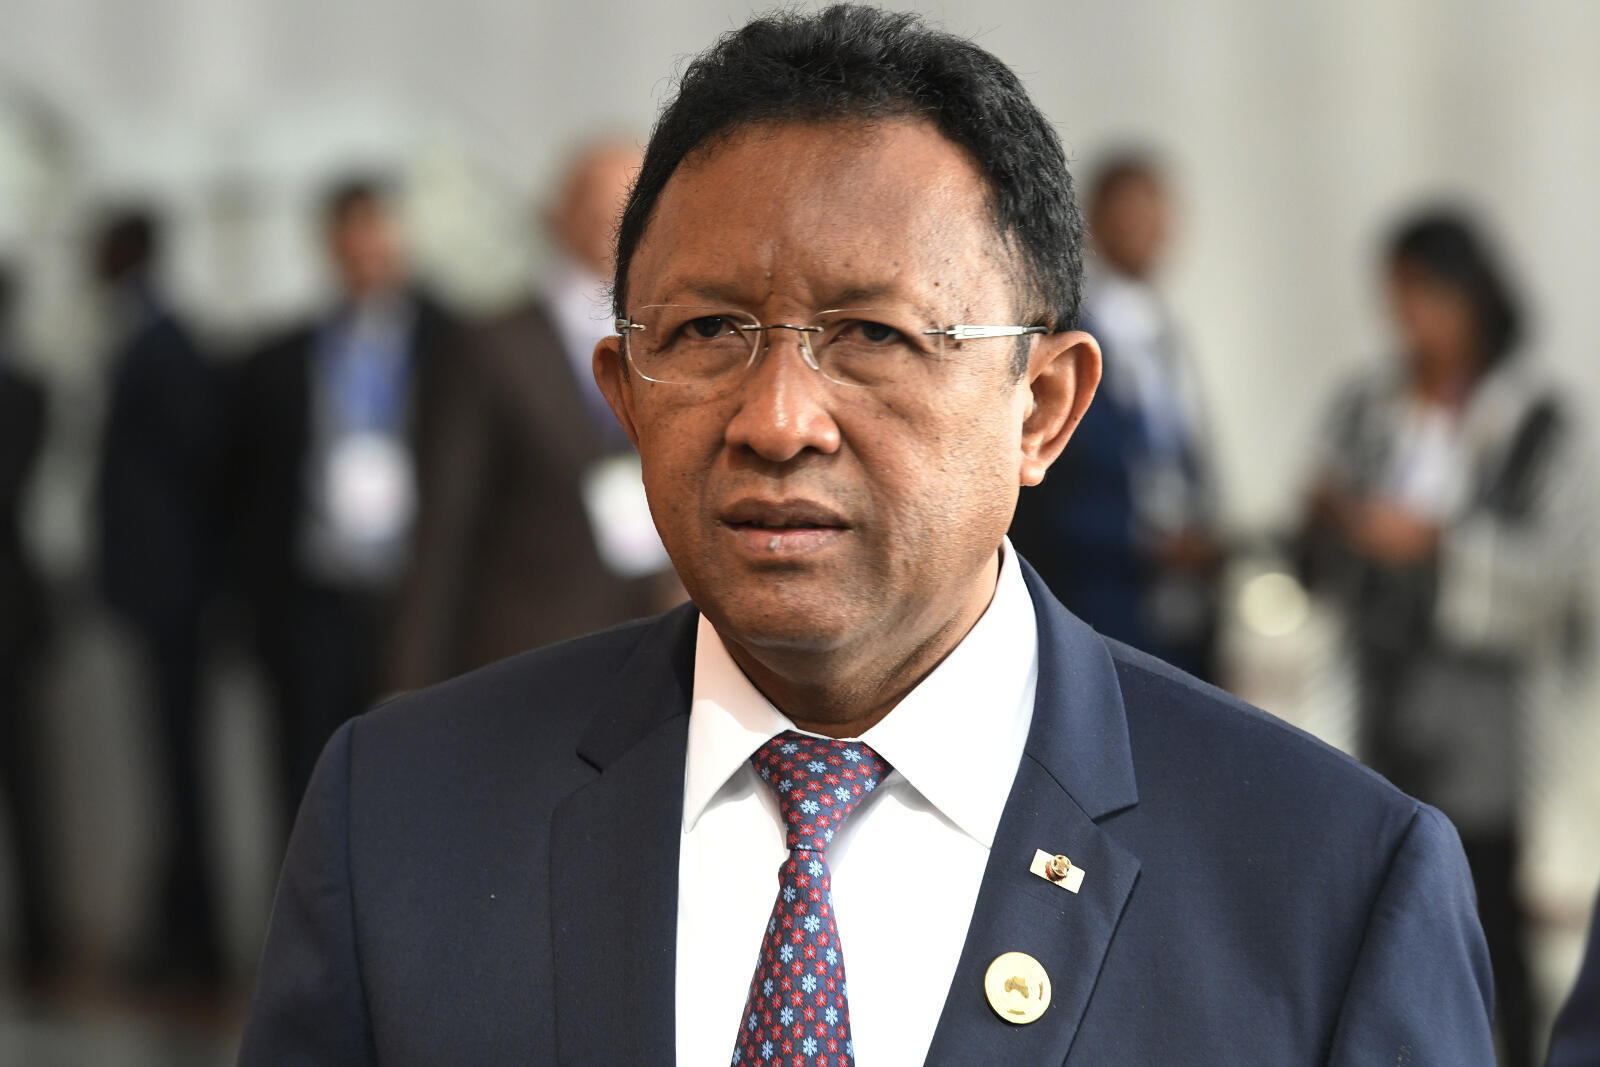 Le président malgache sortant Hery Rajaonarimampianina, le 29 janvier 2018 à Addis-Abeba.